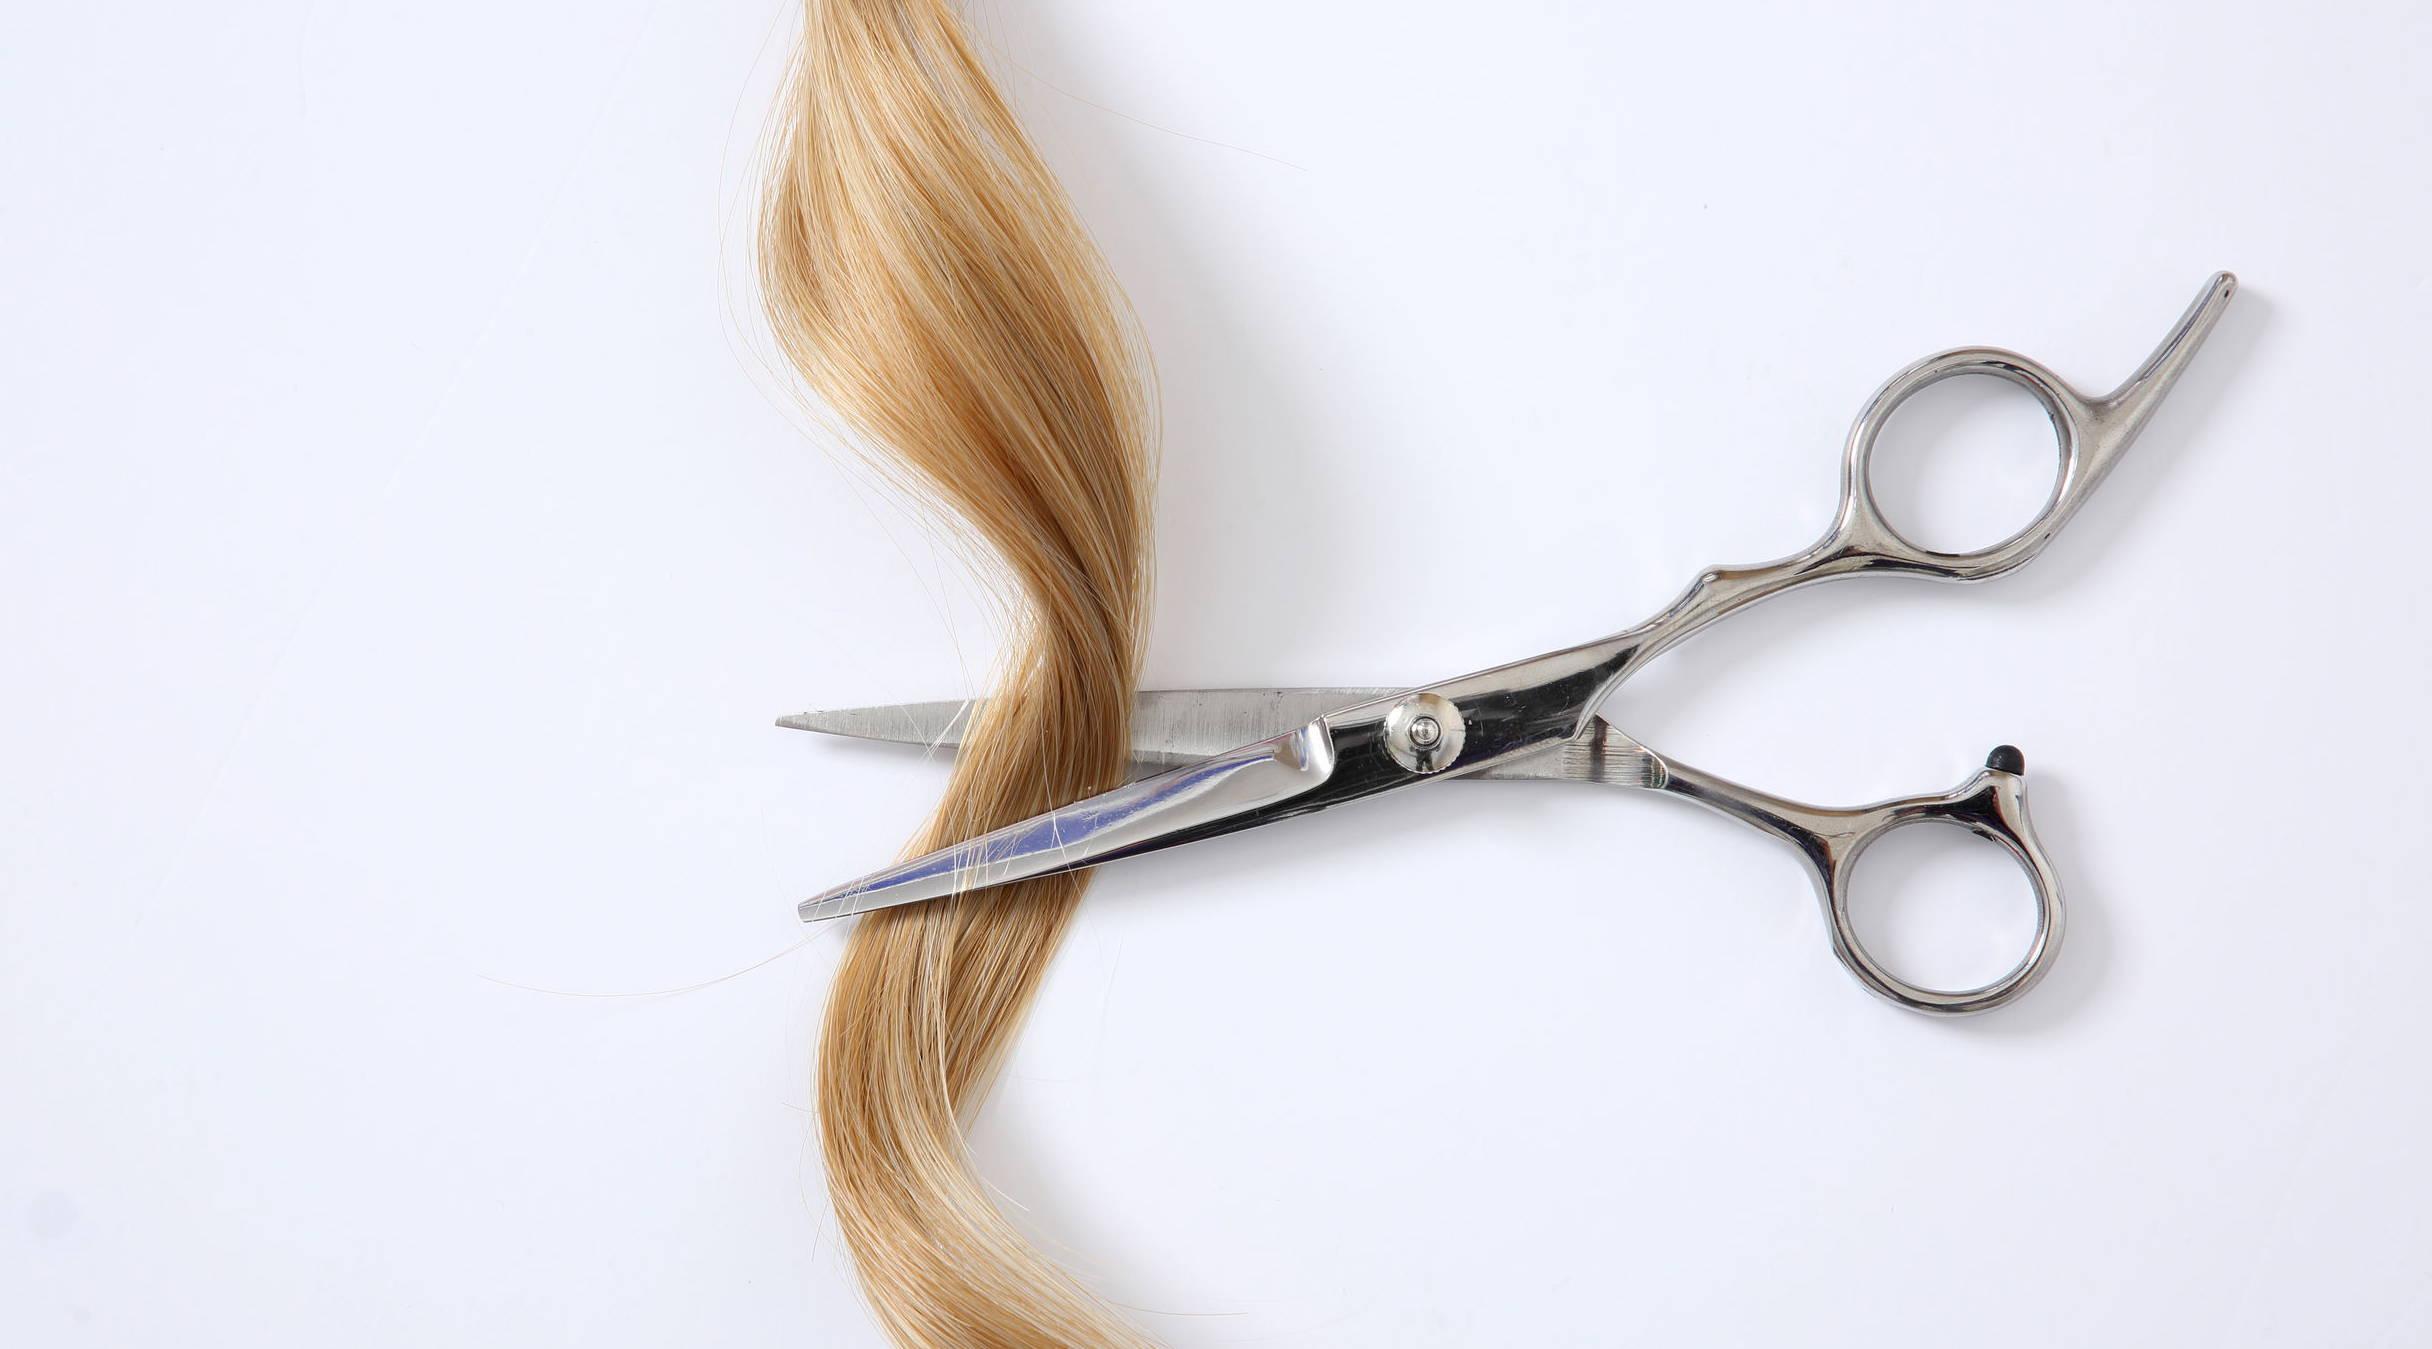 Tremendous Does Cutting Curly Hair Make It Curlier Lus Brands Schematic Wiring Diagrams Amerangerunnerswayorg